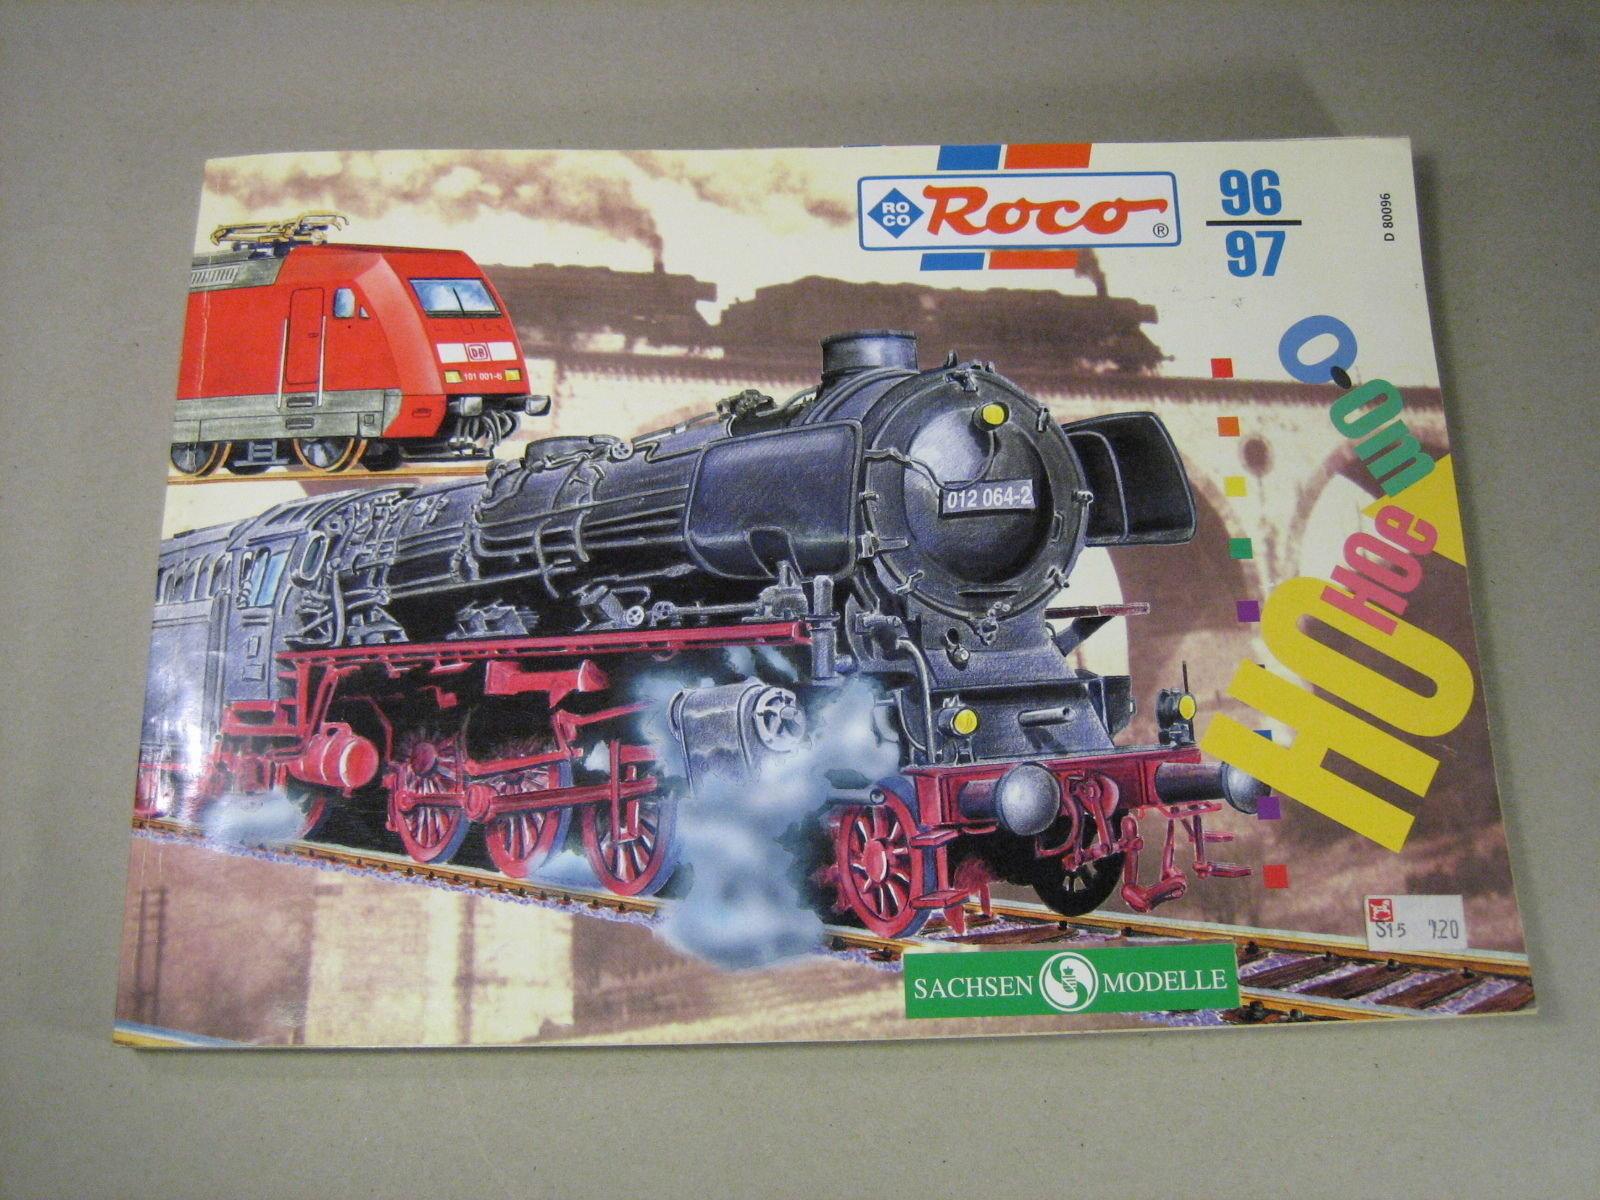 PB002 ROCO 1996-97 CATALOGUE (GERMAN LANGUAGE)